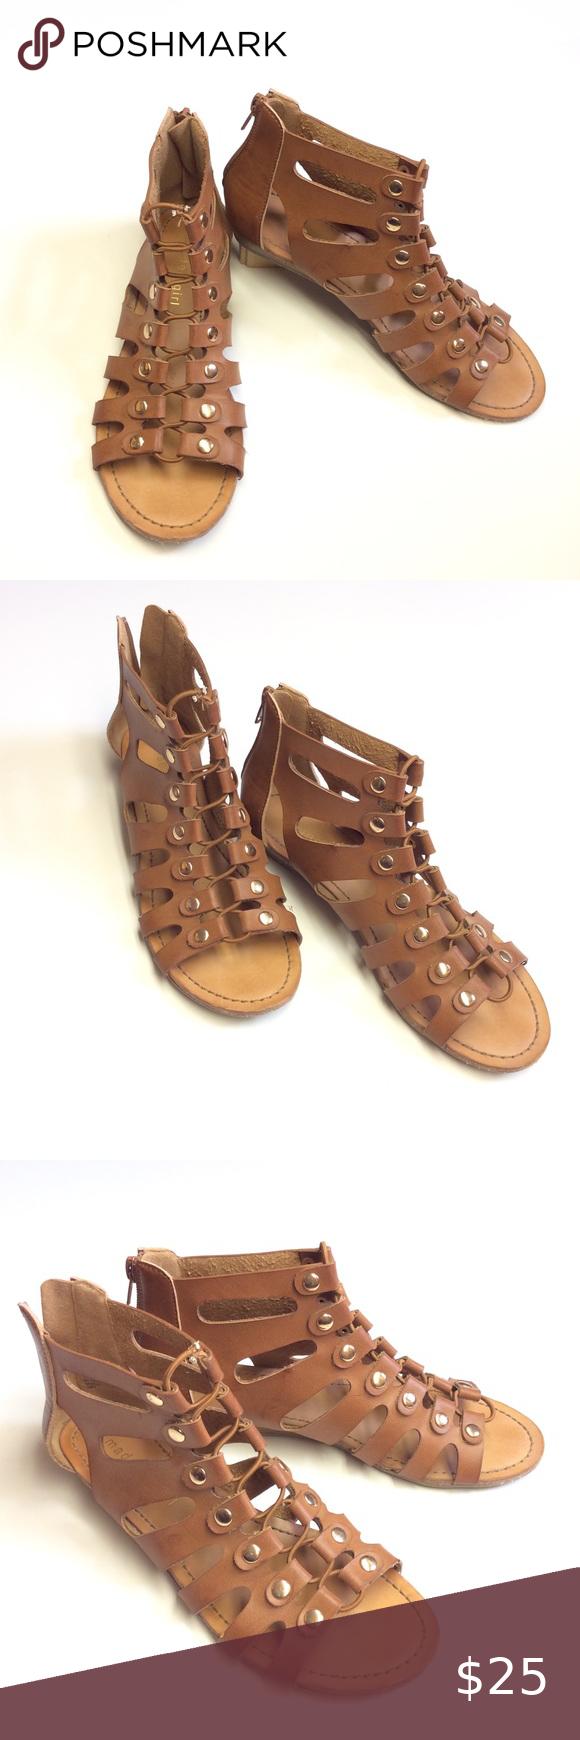 Madden Girl Gladiator Sandals Tan Brown